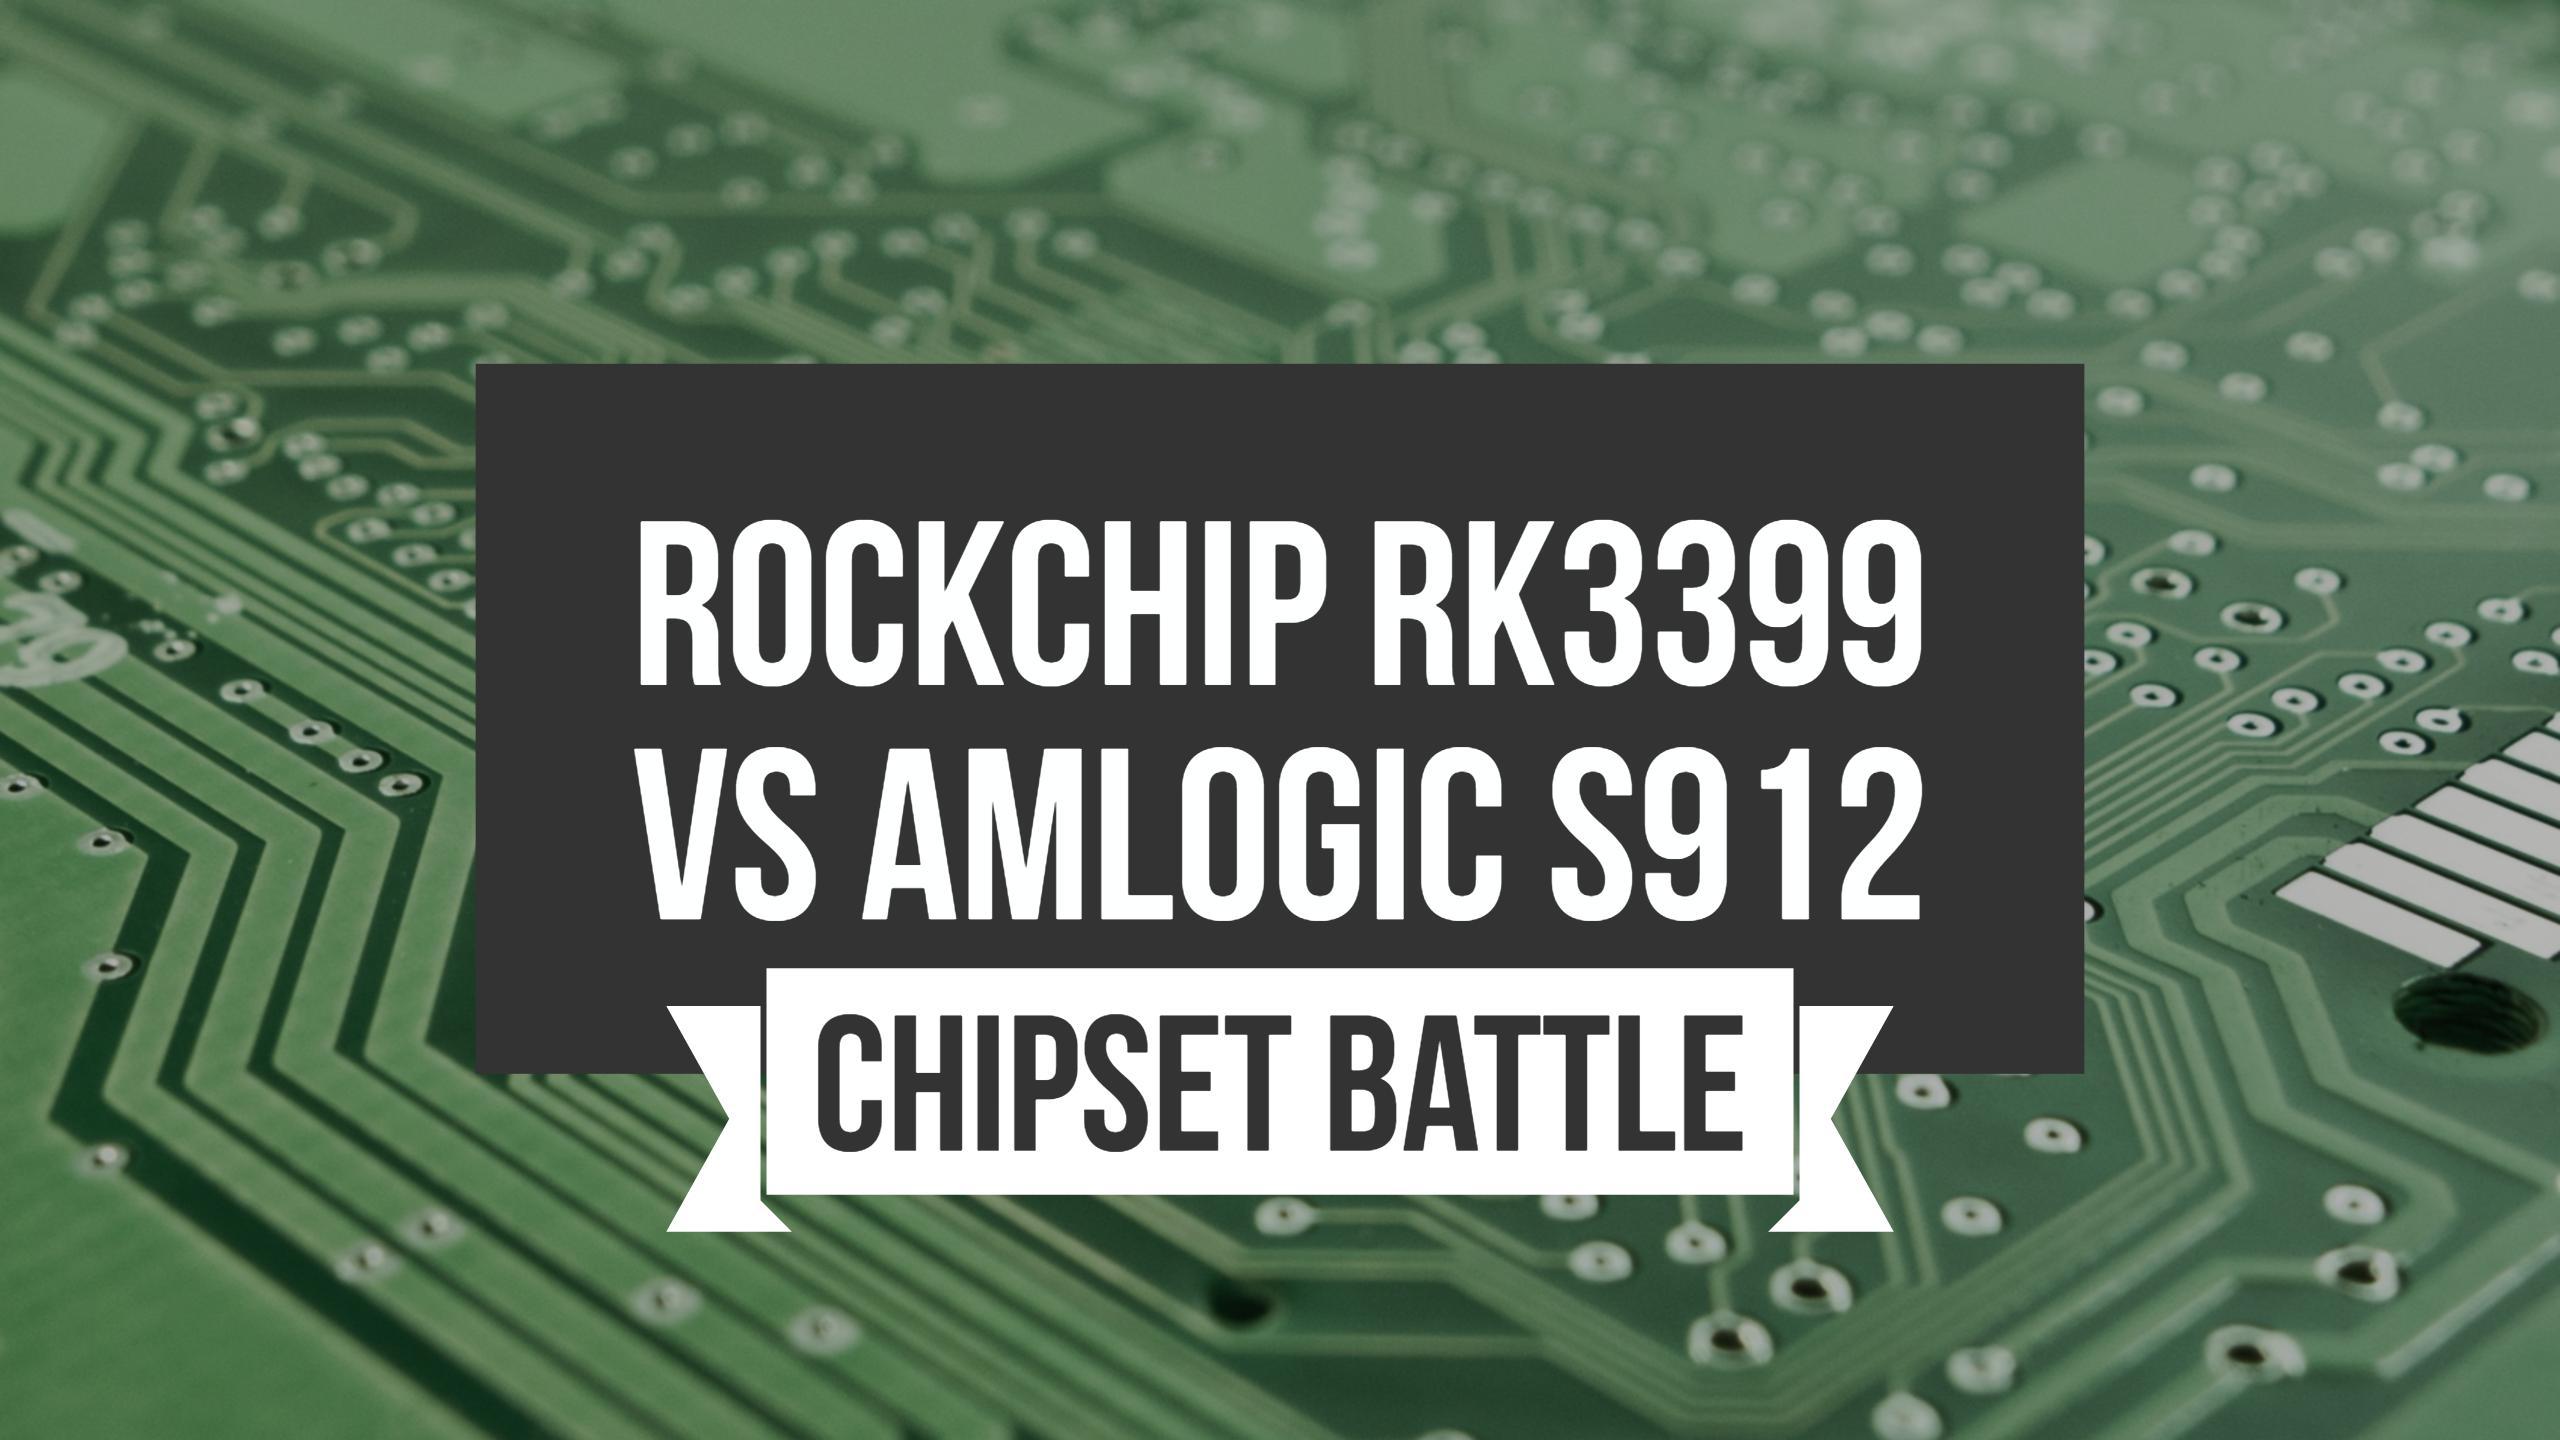 RK3399 vs S912 Best SoC